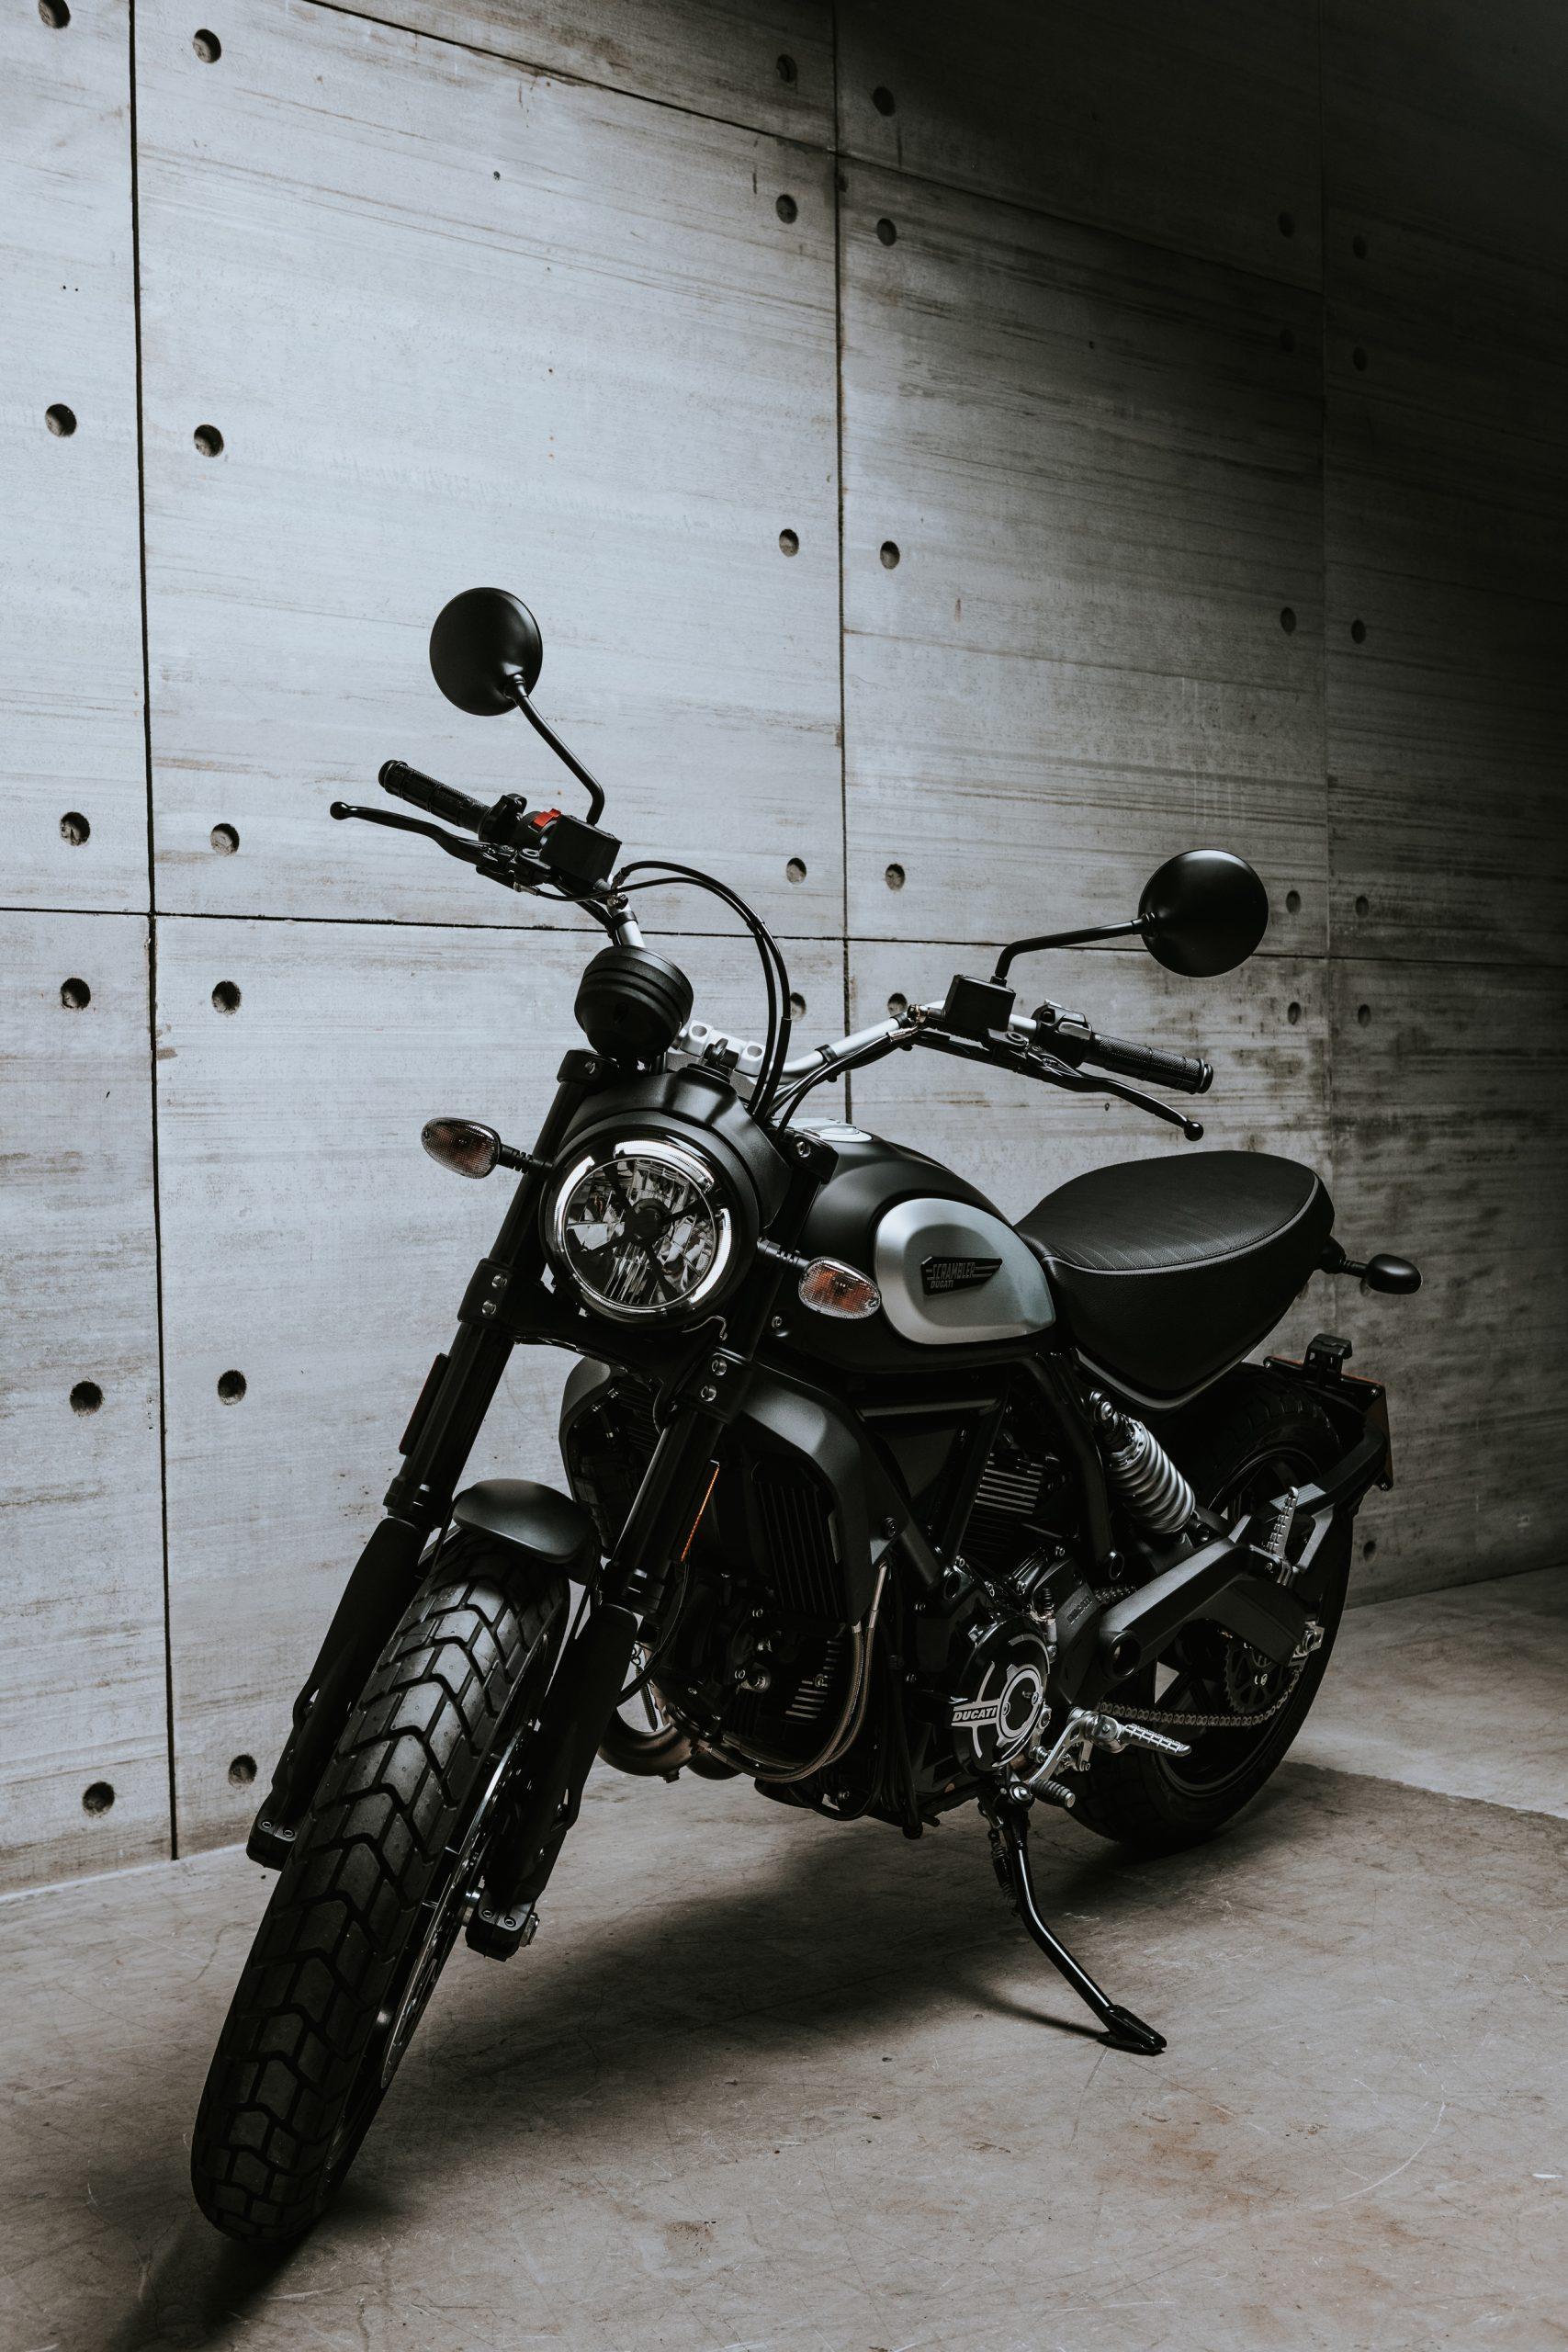 2020 Ducati Ducati Scrambler Icon Dark - The Motorcycle Shows